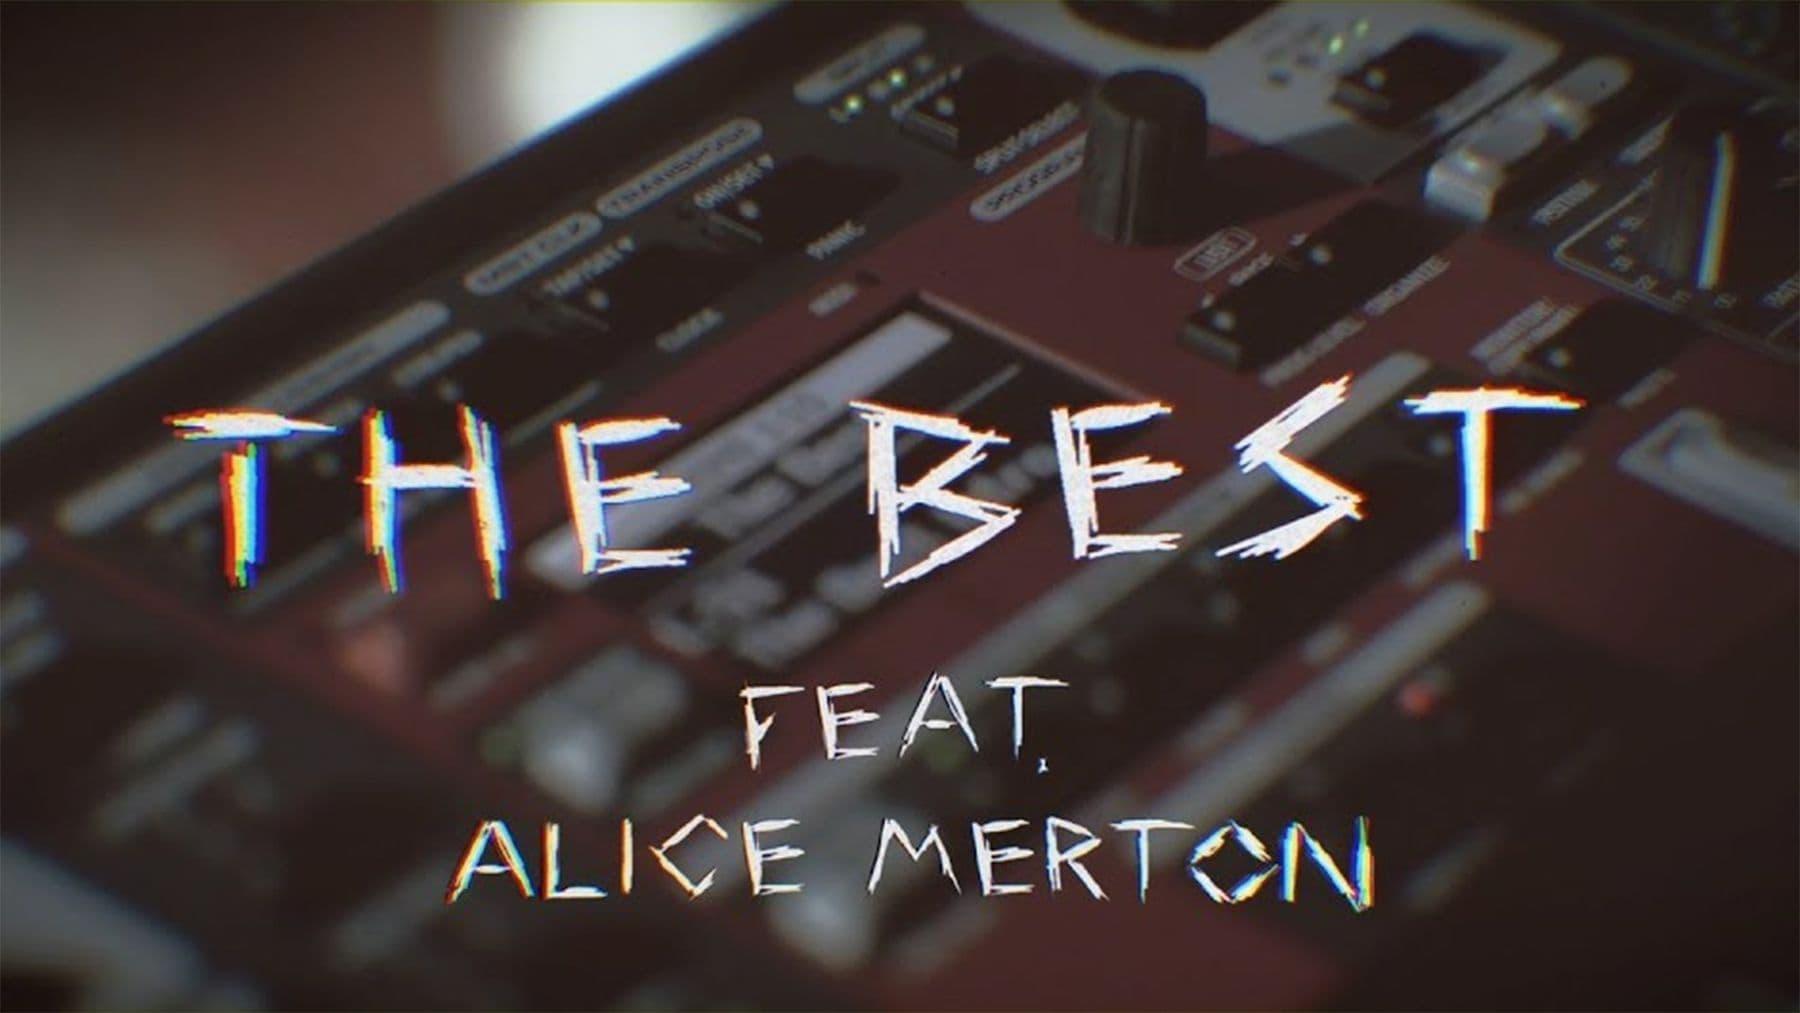 AWOLNATION - The Best (feat. Alice Merton) | Musik | Was is hier eigentlich los?